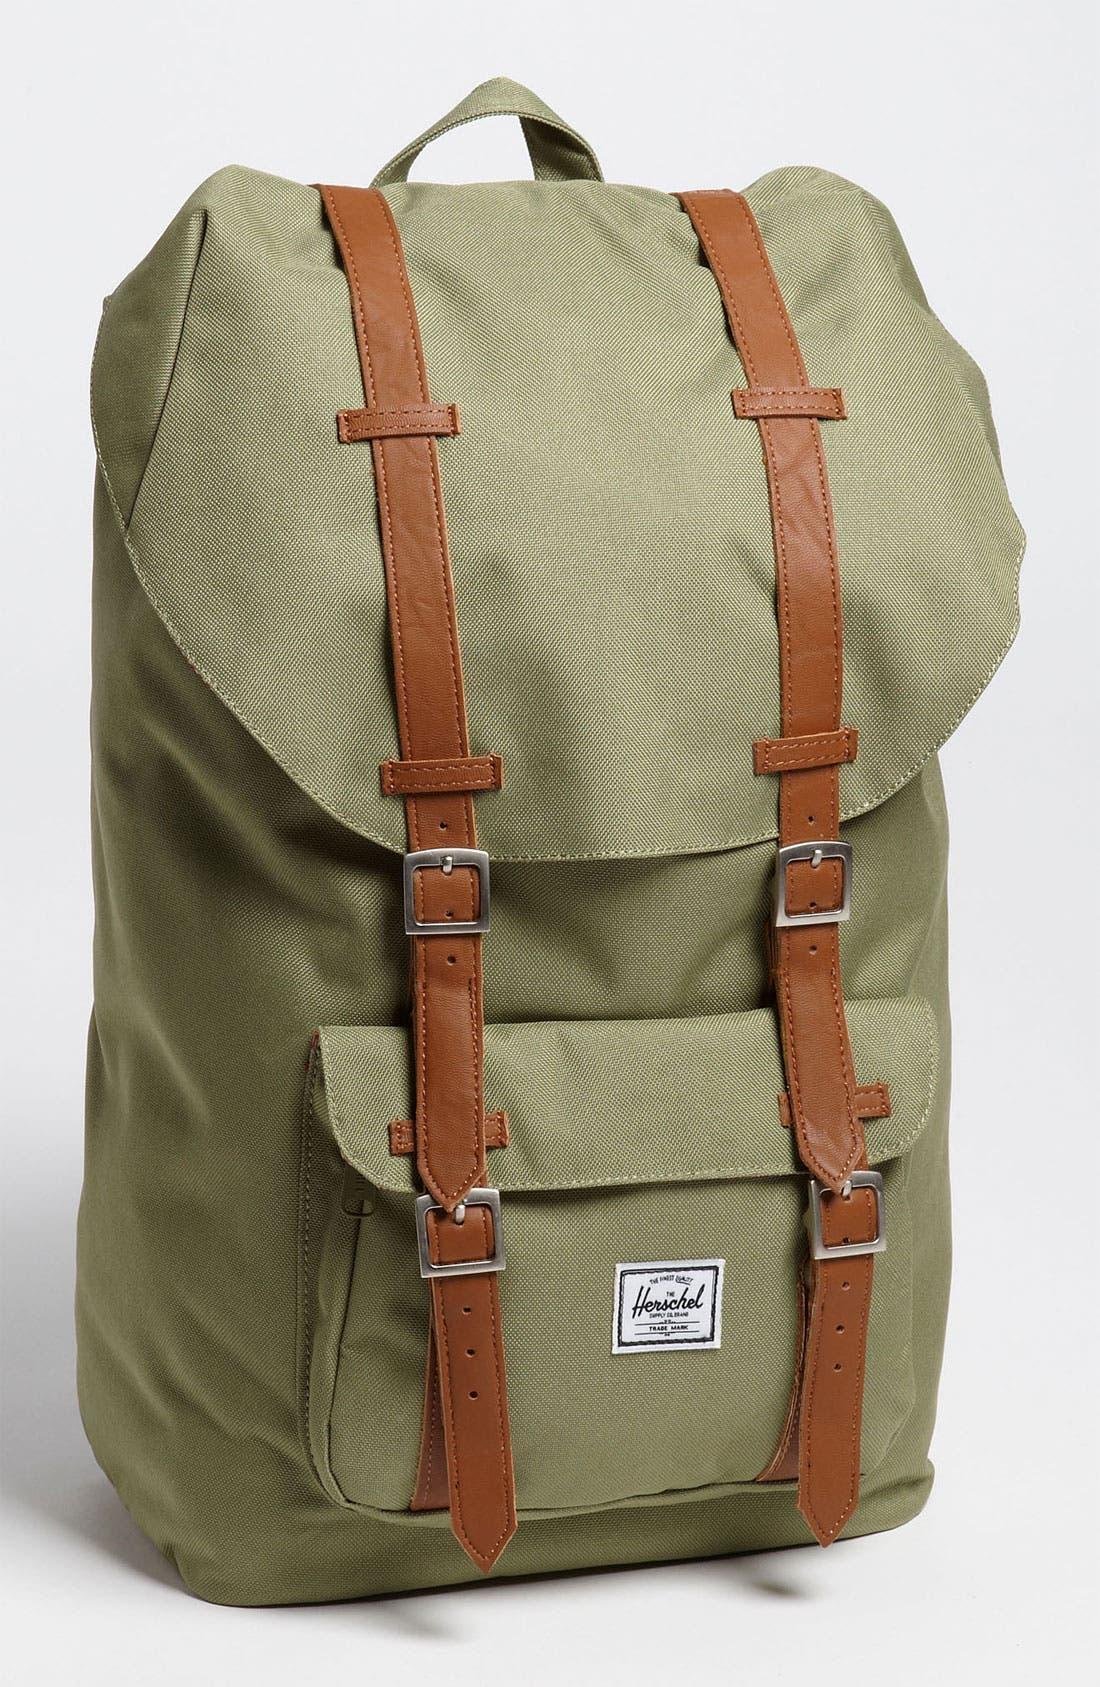 Alternate Image 1 Selected - Herschel Supply Co. 'Little America' Backpack